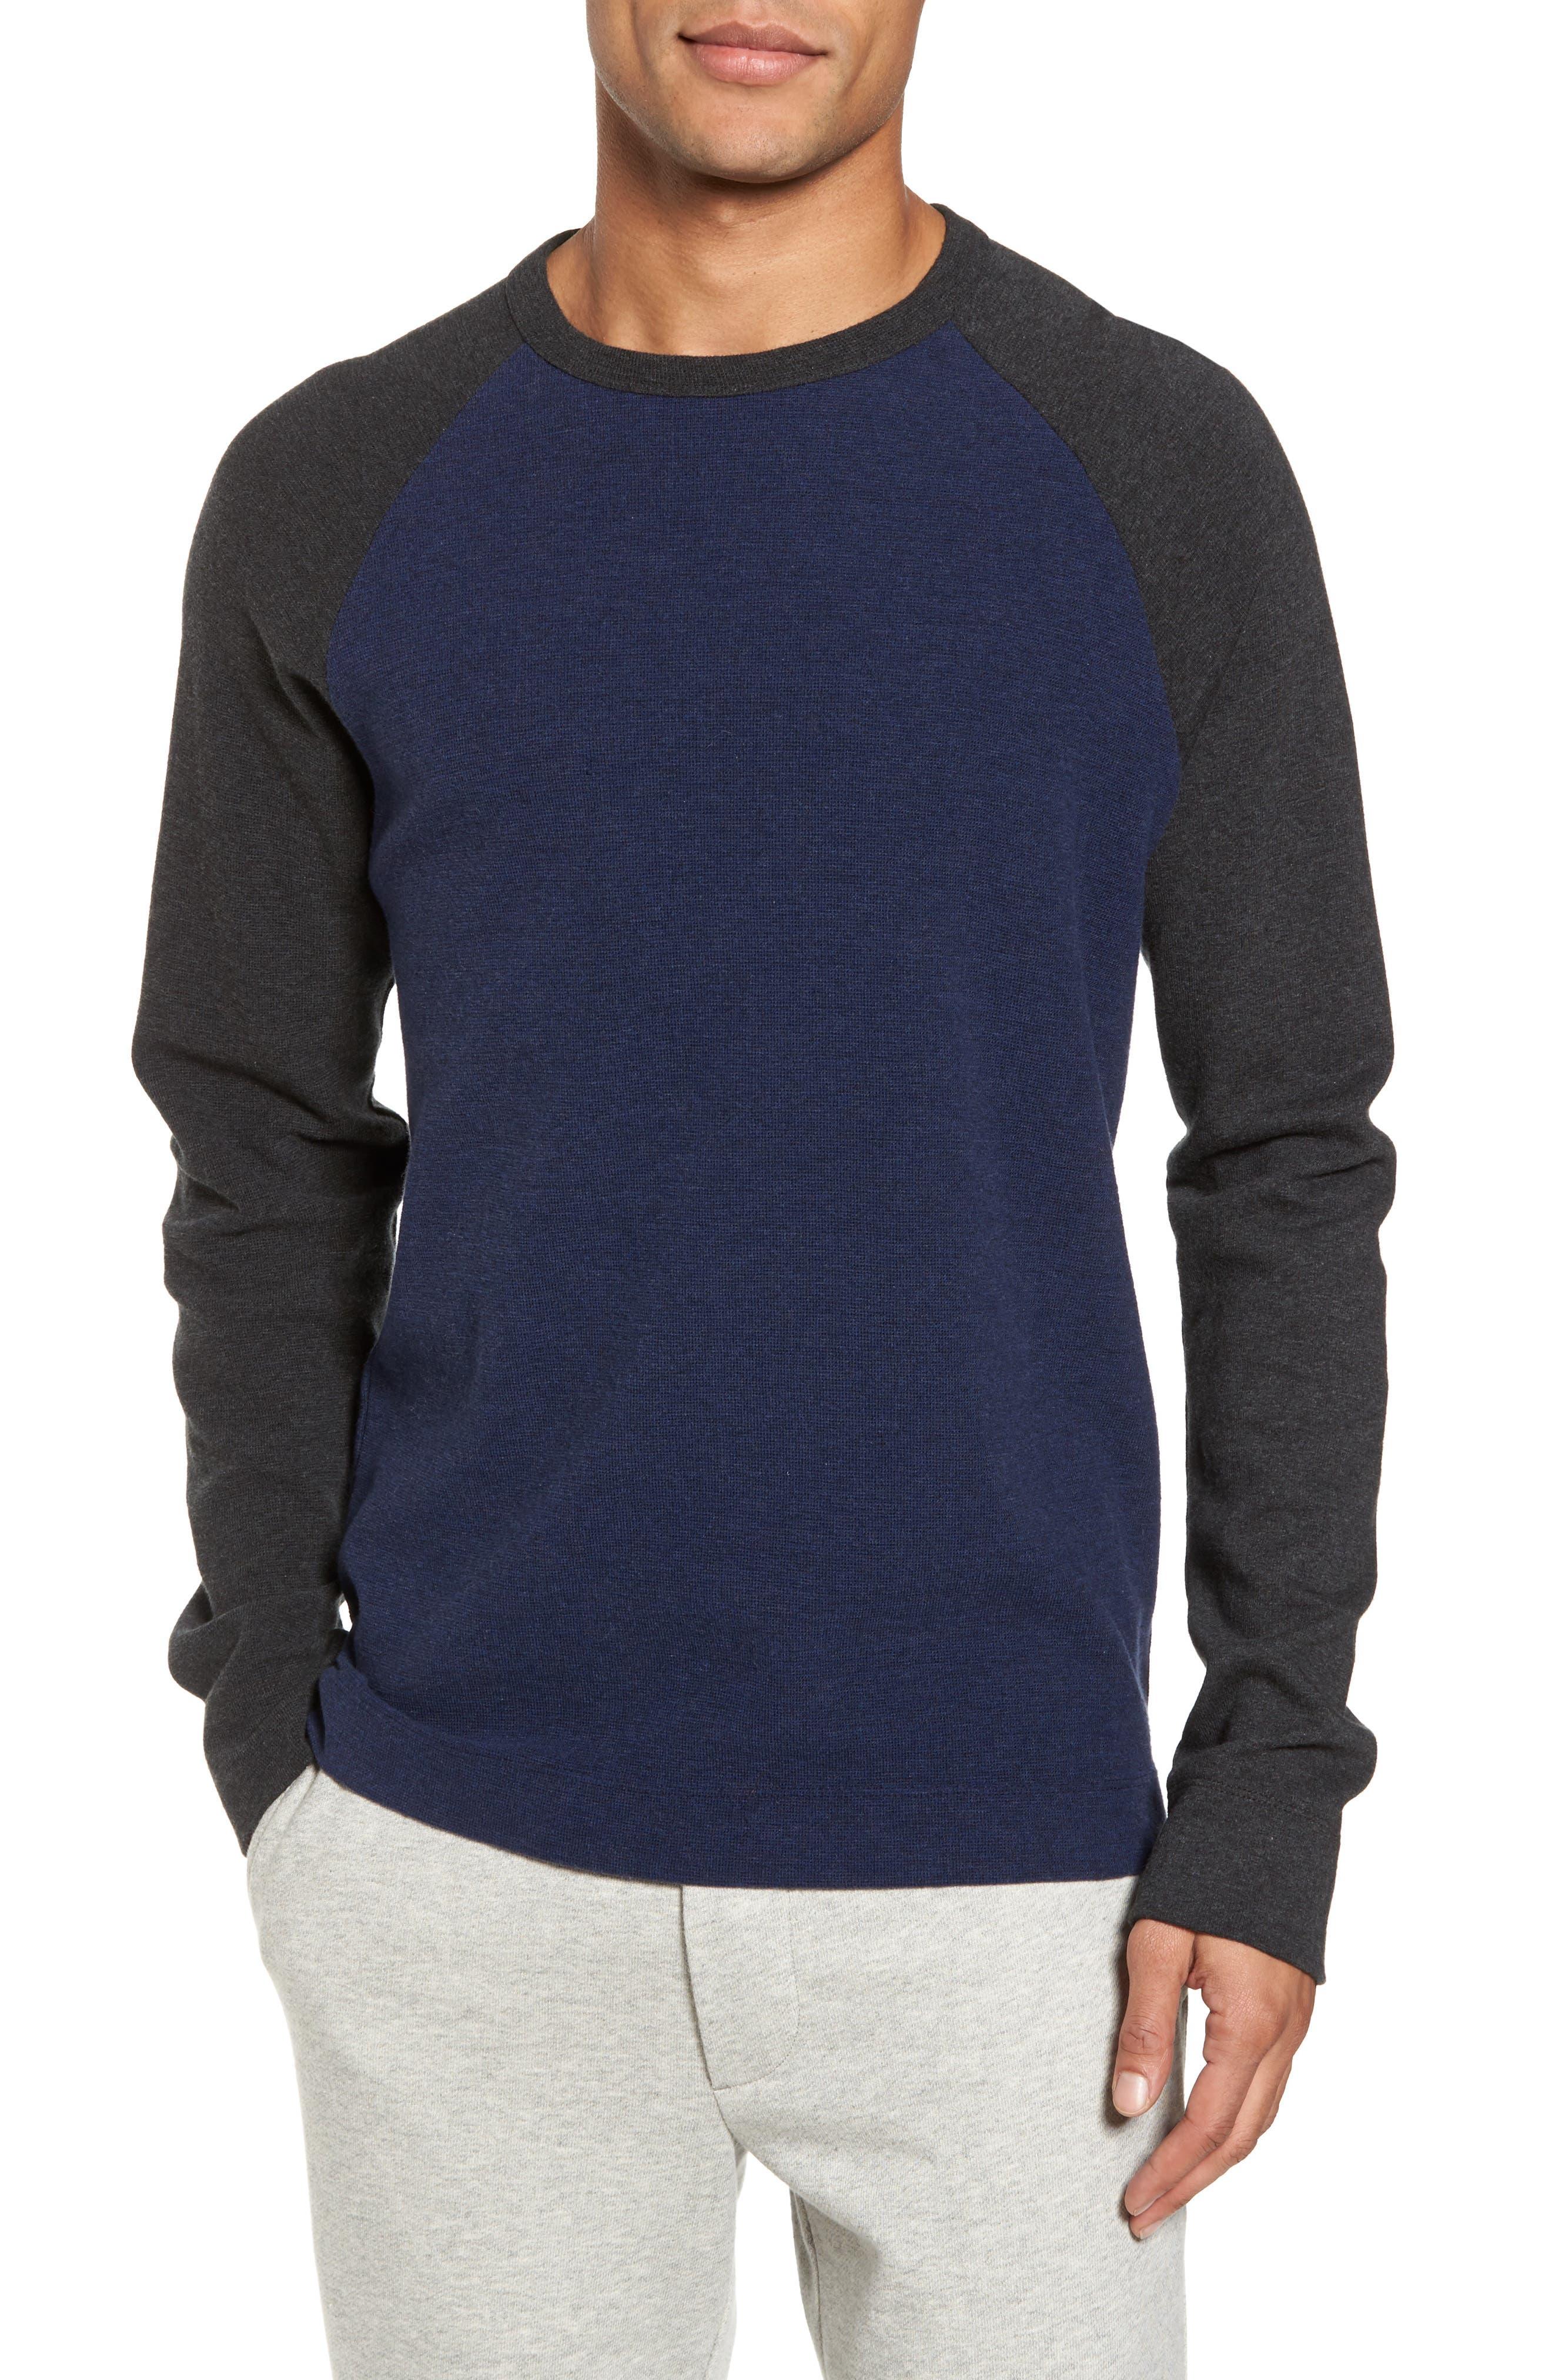 Thermal Knit Raglan Sweatshirt,                         Main,                         color, Heather Navy/ Heather Charcoal